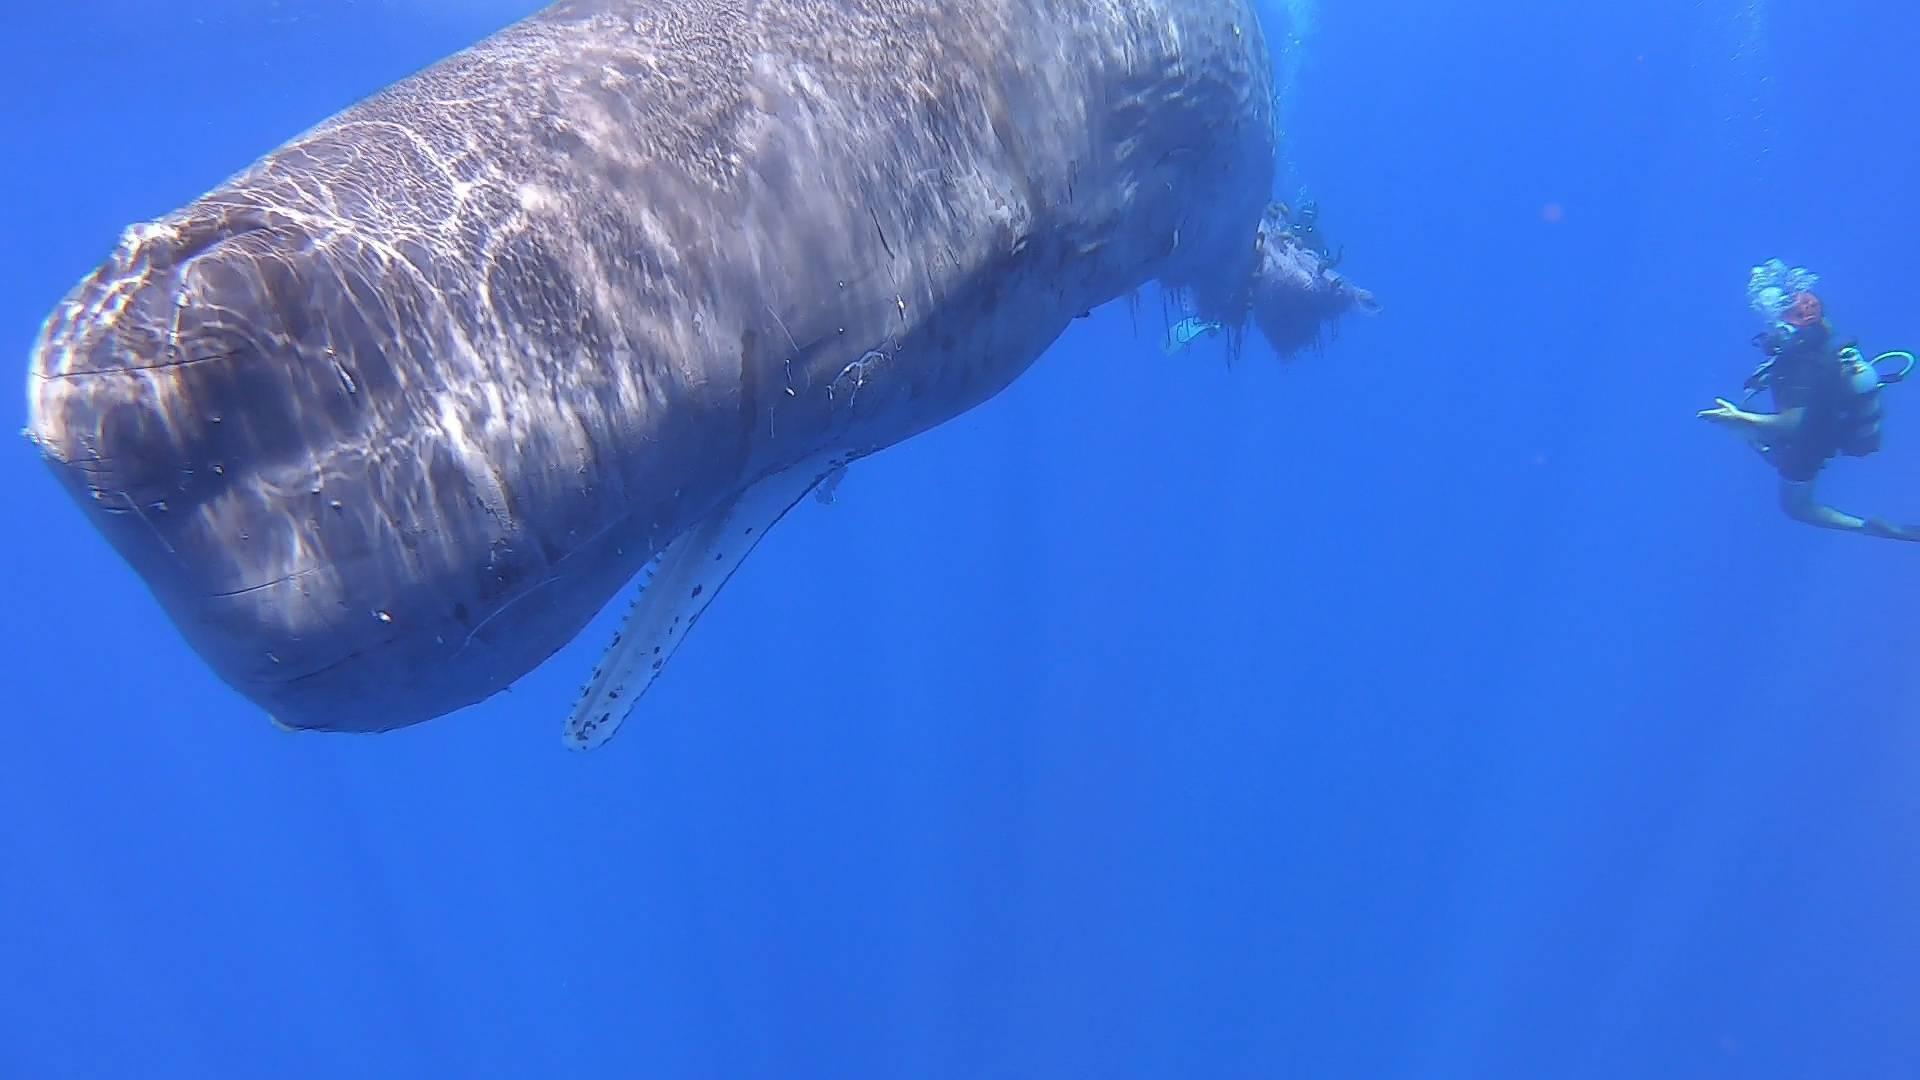 Italian coastguards work to free sperm whale entangled in fishing net